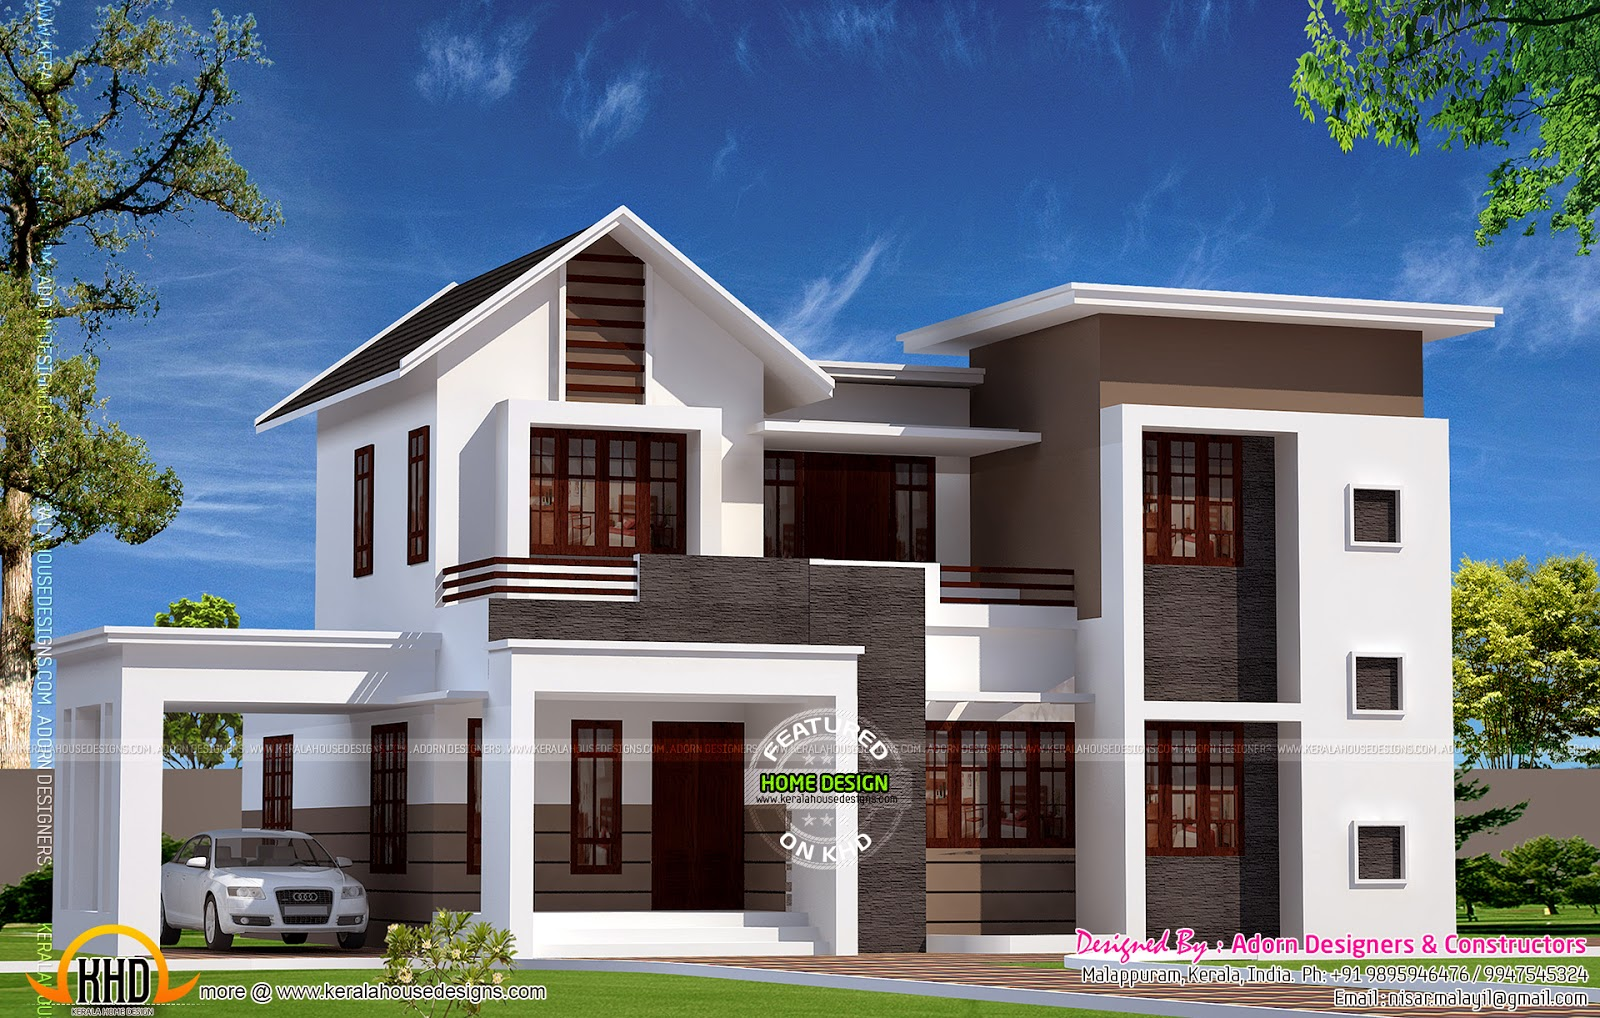 house design sq feet kerala home design floor plans home floor plans home interior design